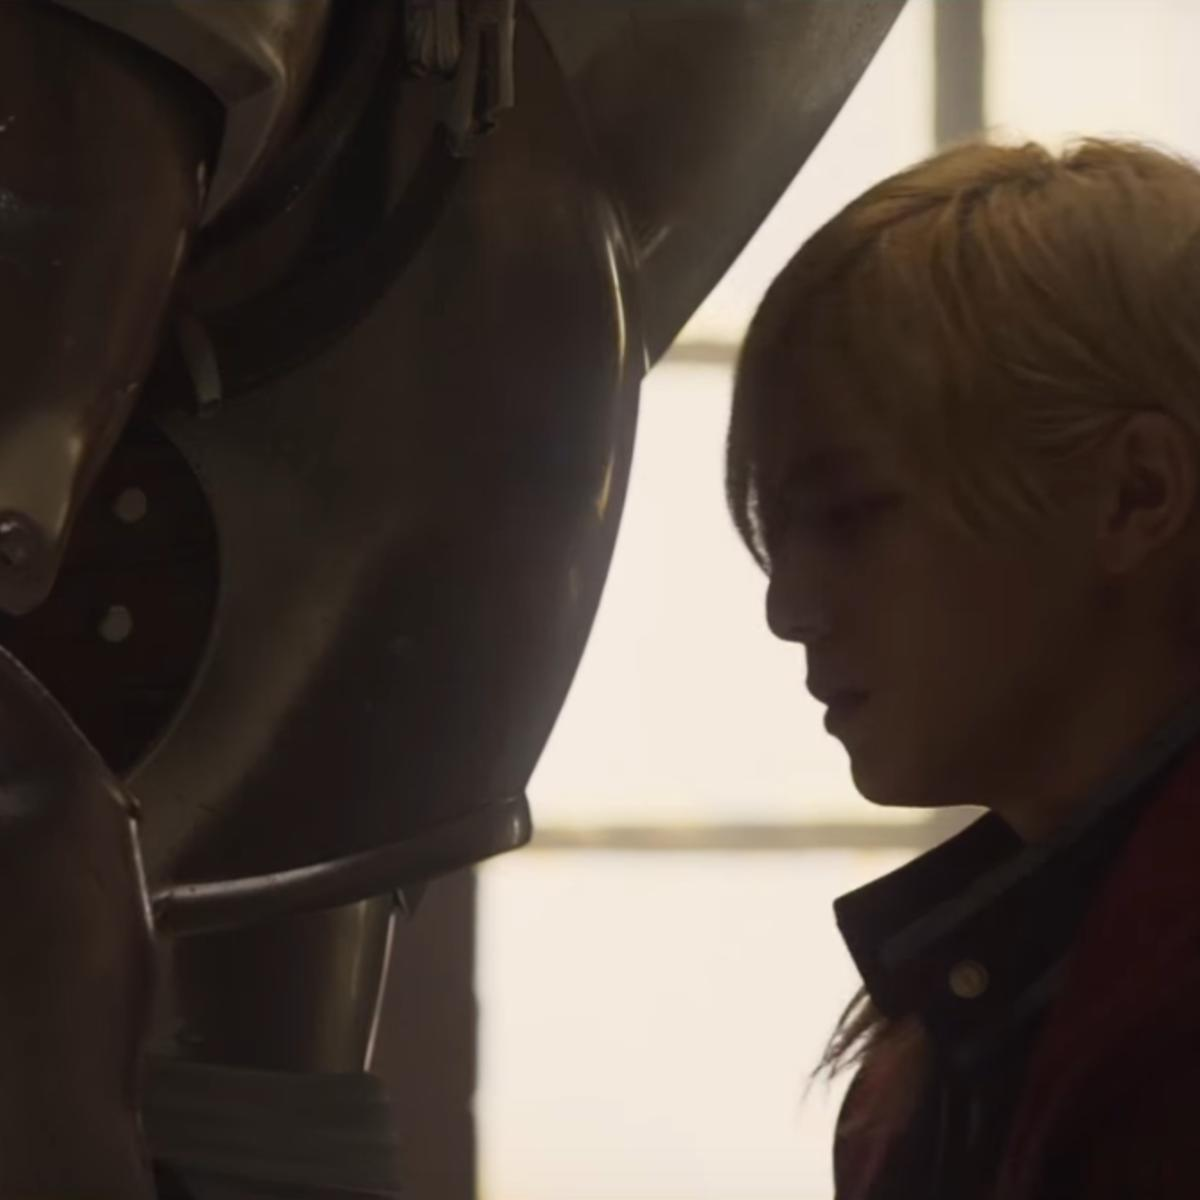 Fullmetal-Alchemist-teaser-screengrab_.png